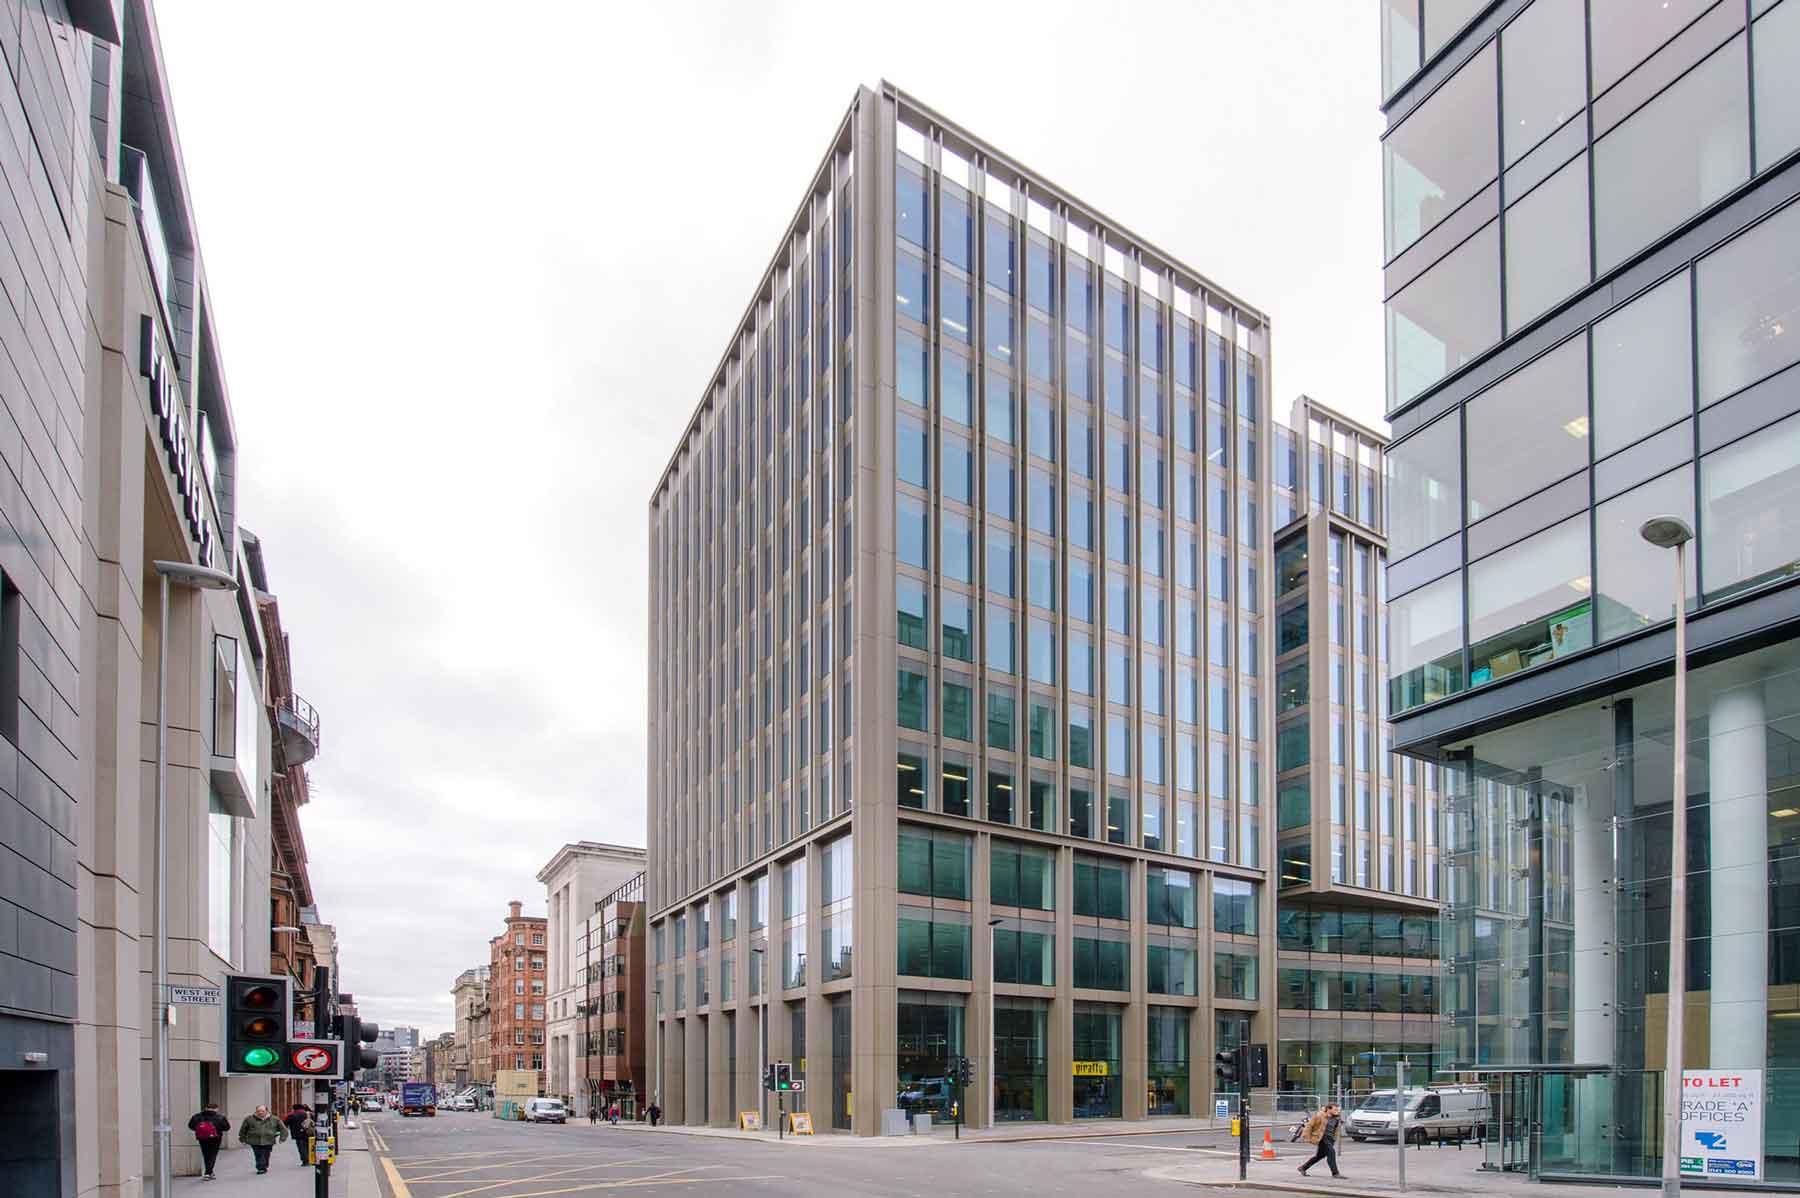 One West Regent Street